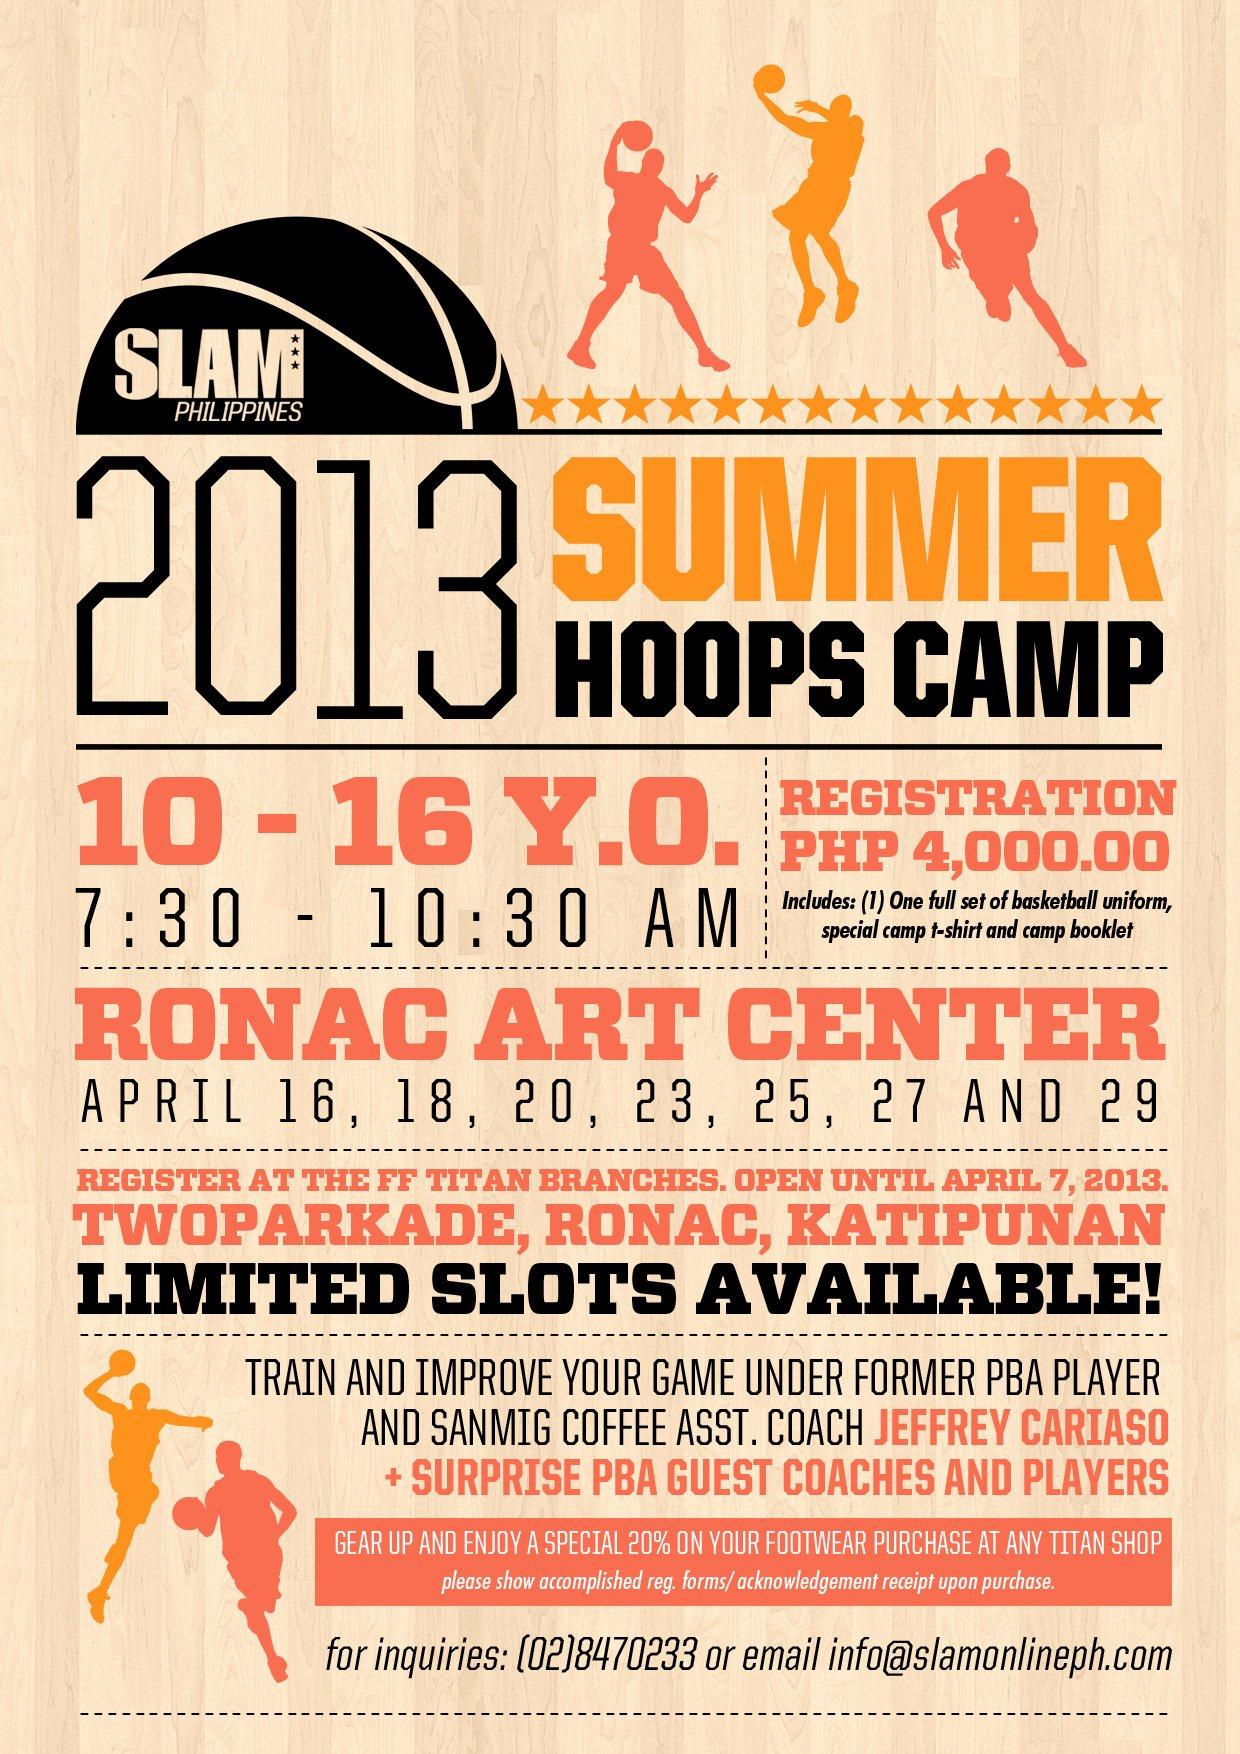 Basketball Camp Flyer Template Elegant Slam 2013 Summer Hoops Camp